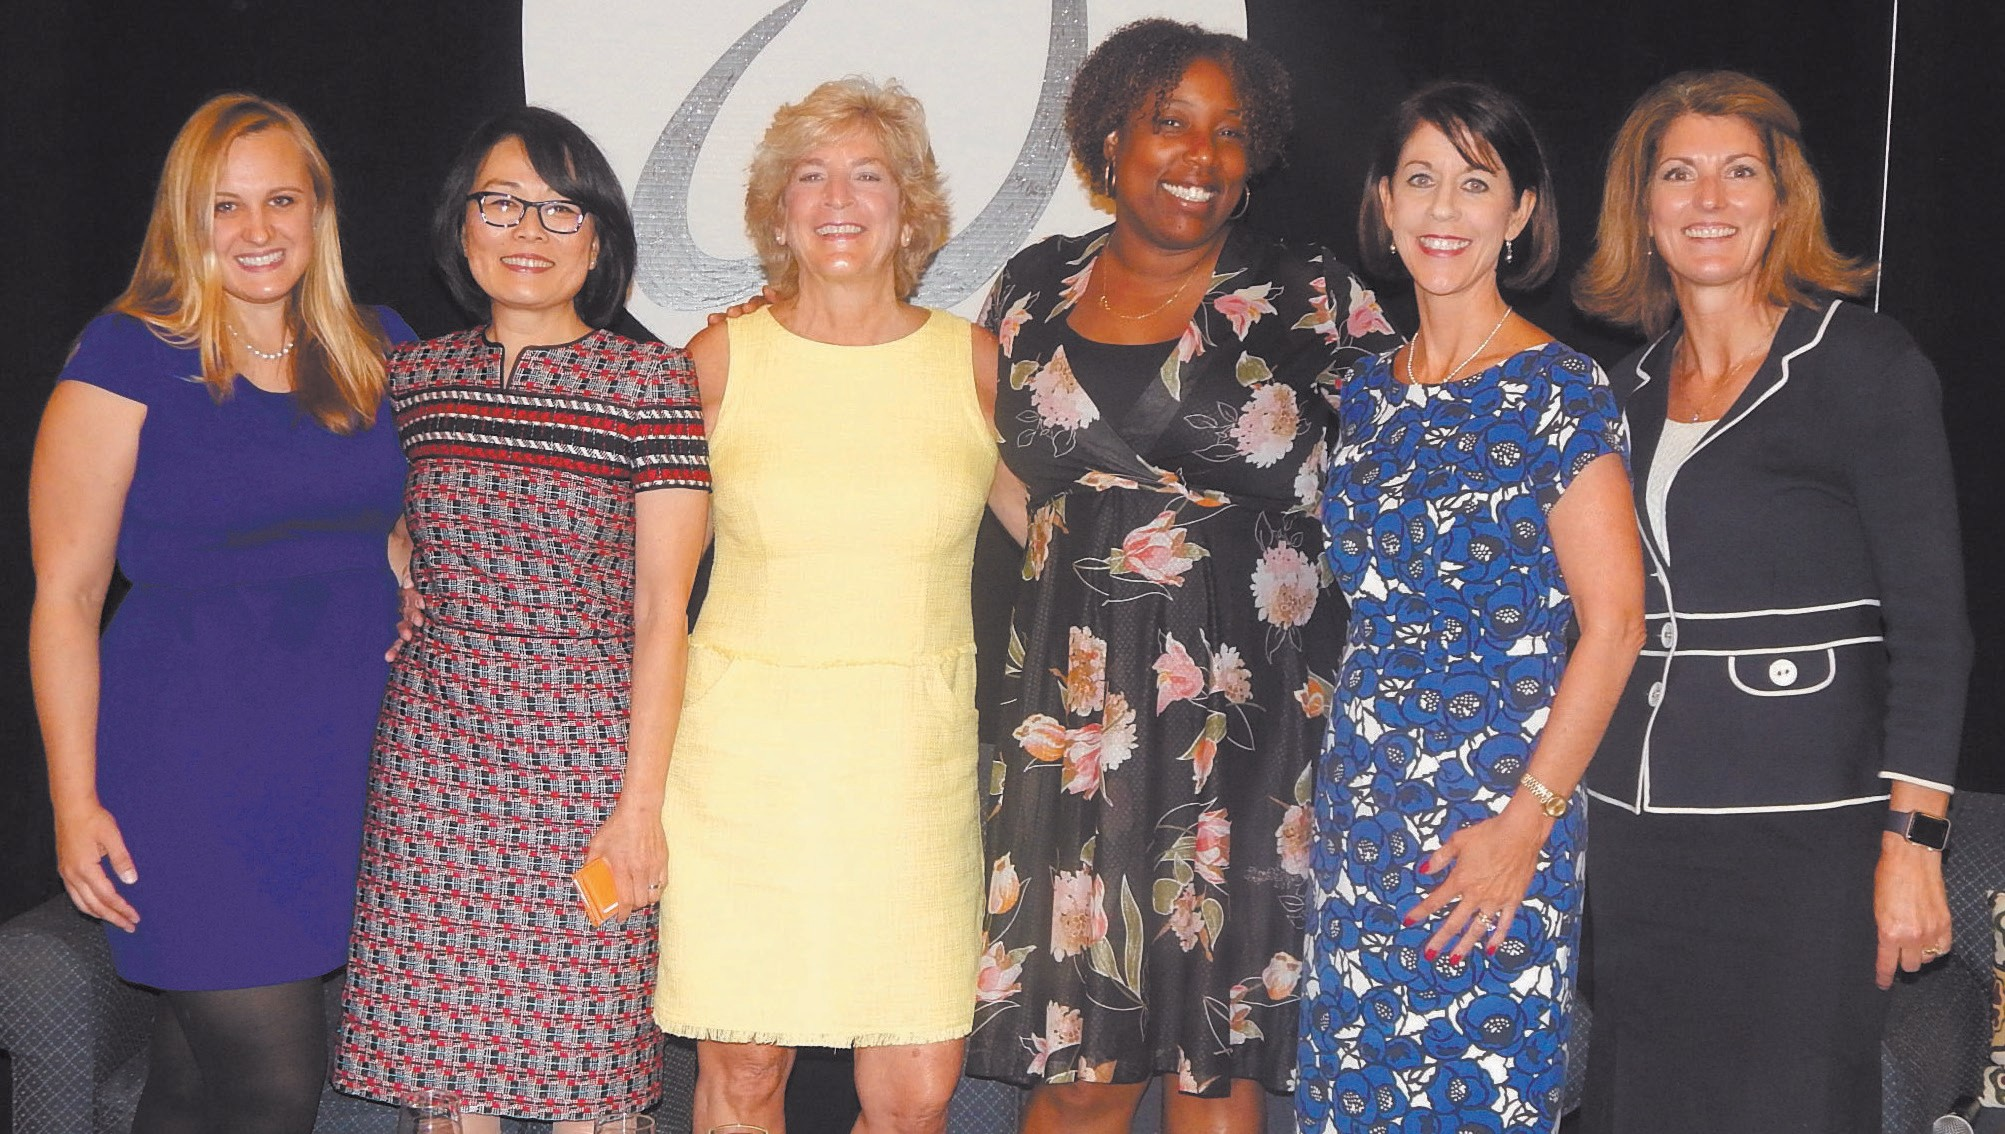 Sarah McCammon-Panelist, Leda Chong-Panelist, Susan Speros-Panelist, Mashama Bailey-Panelist, Meg Heap-Moderator, Women's Legacy Chair-Deb Thompson